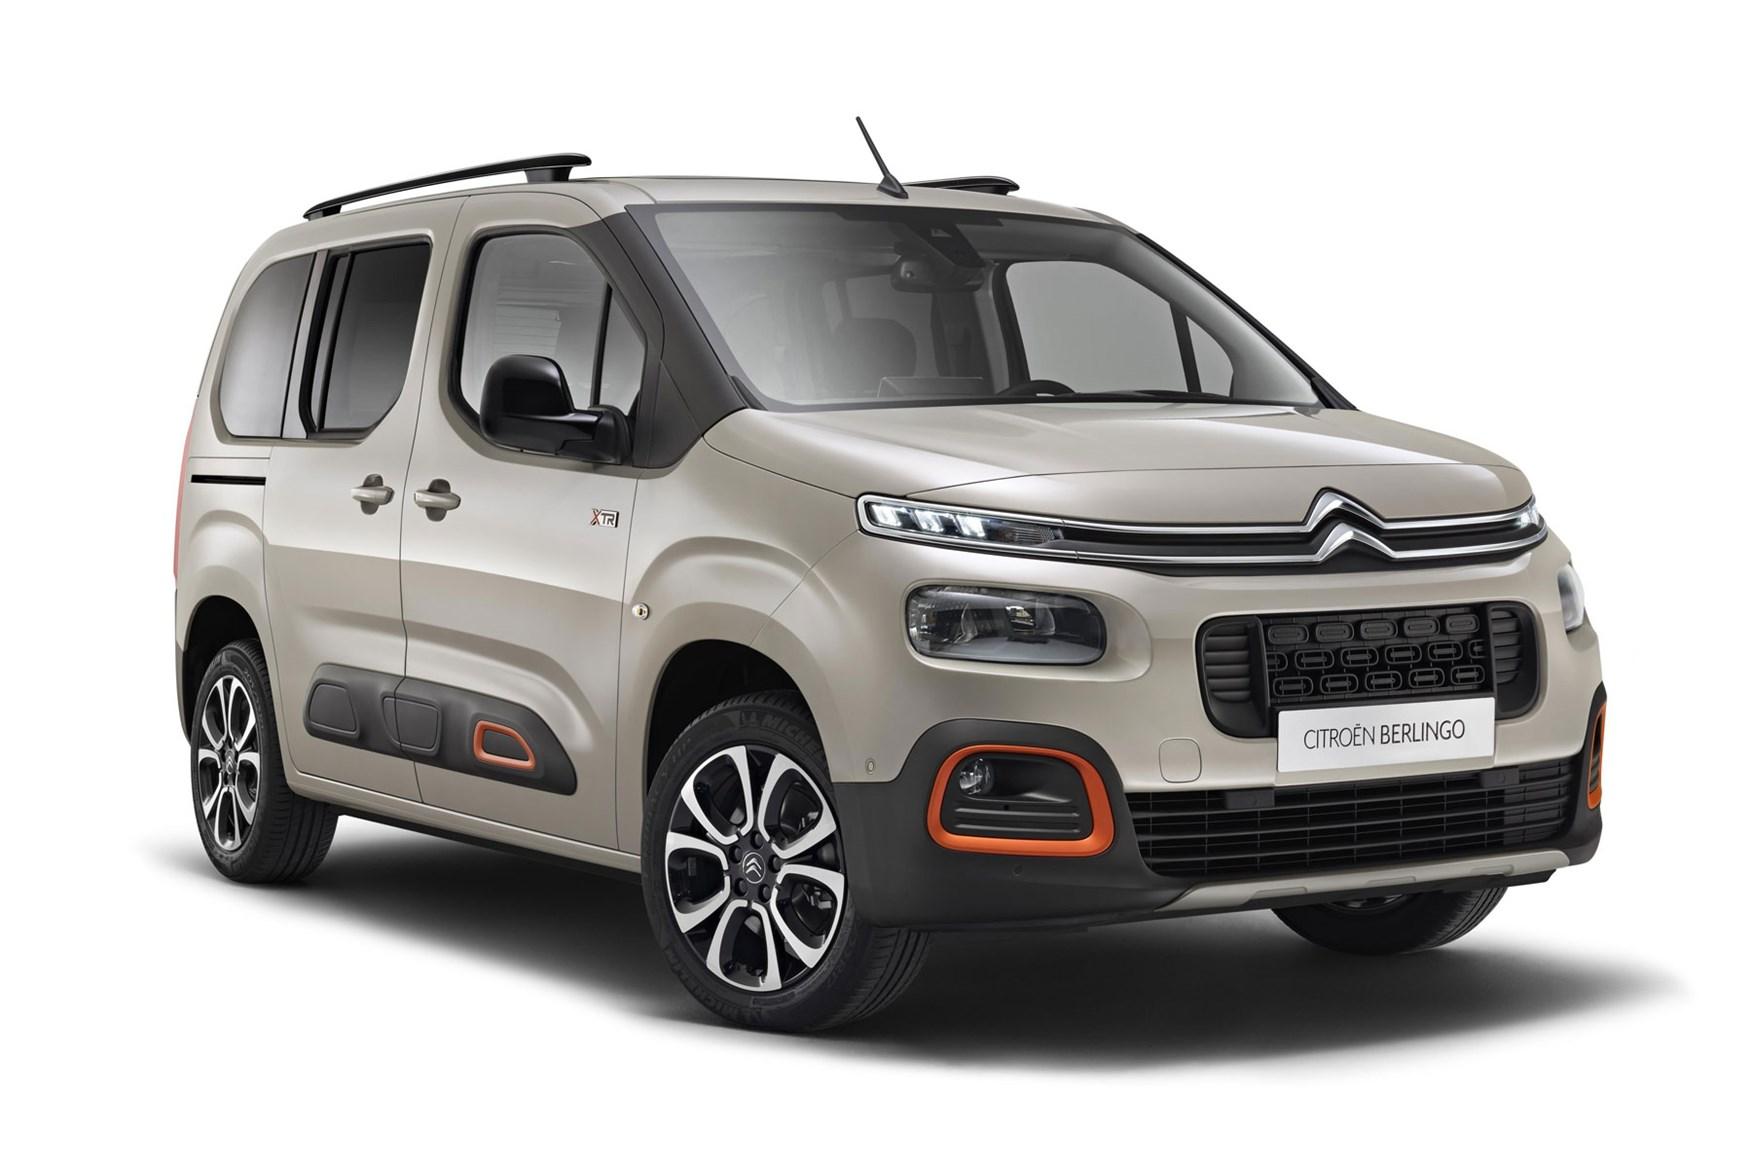 First Official Pictures Details Of 2018 Citroen Berlingo Peugeot